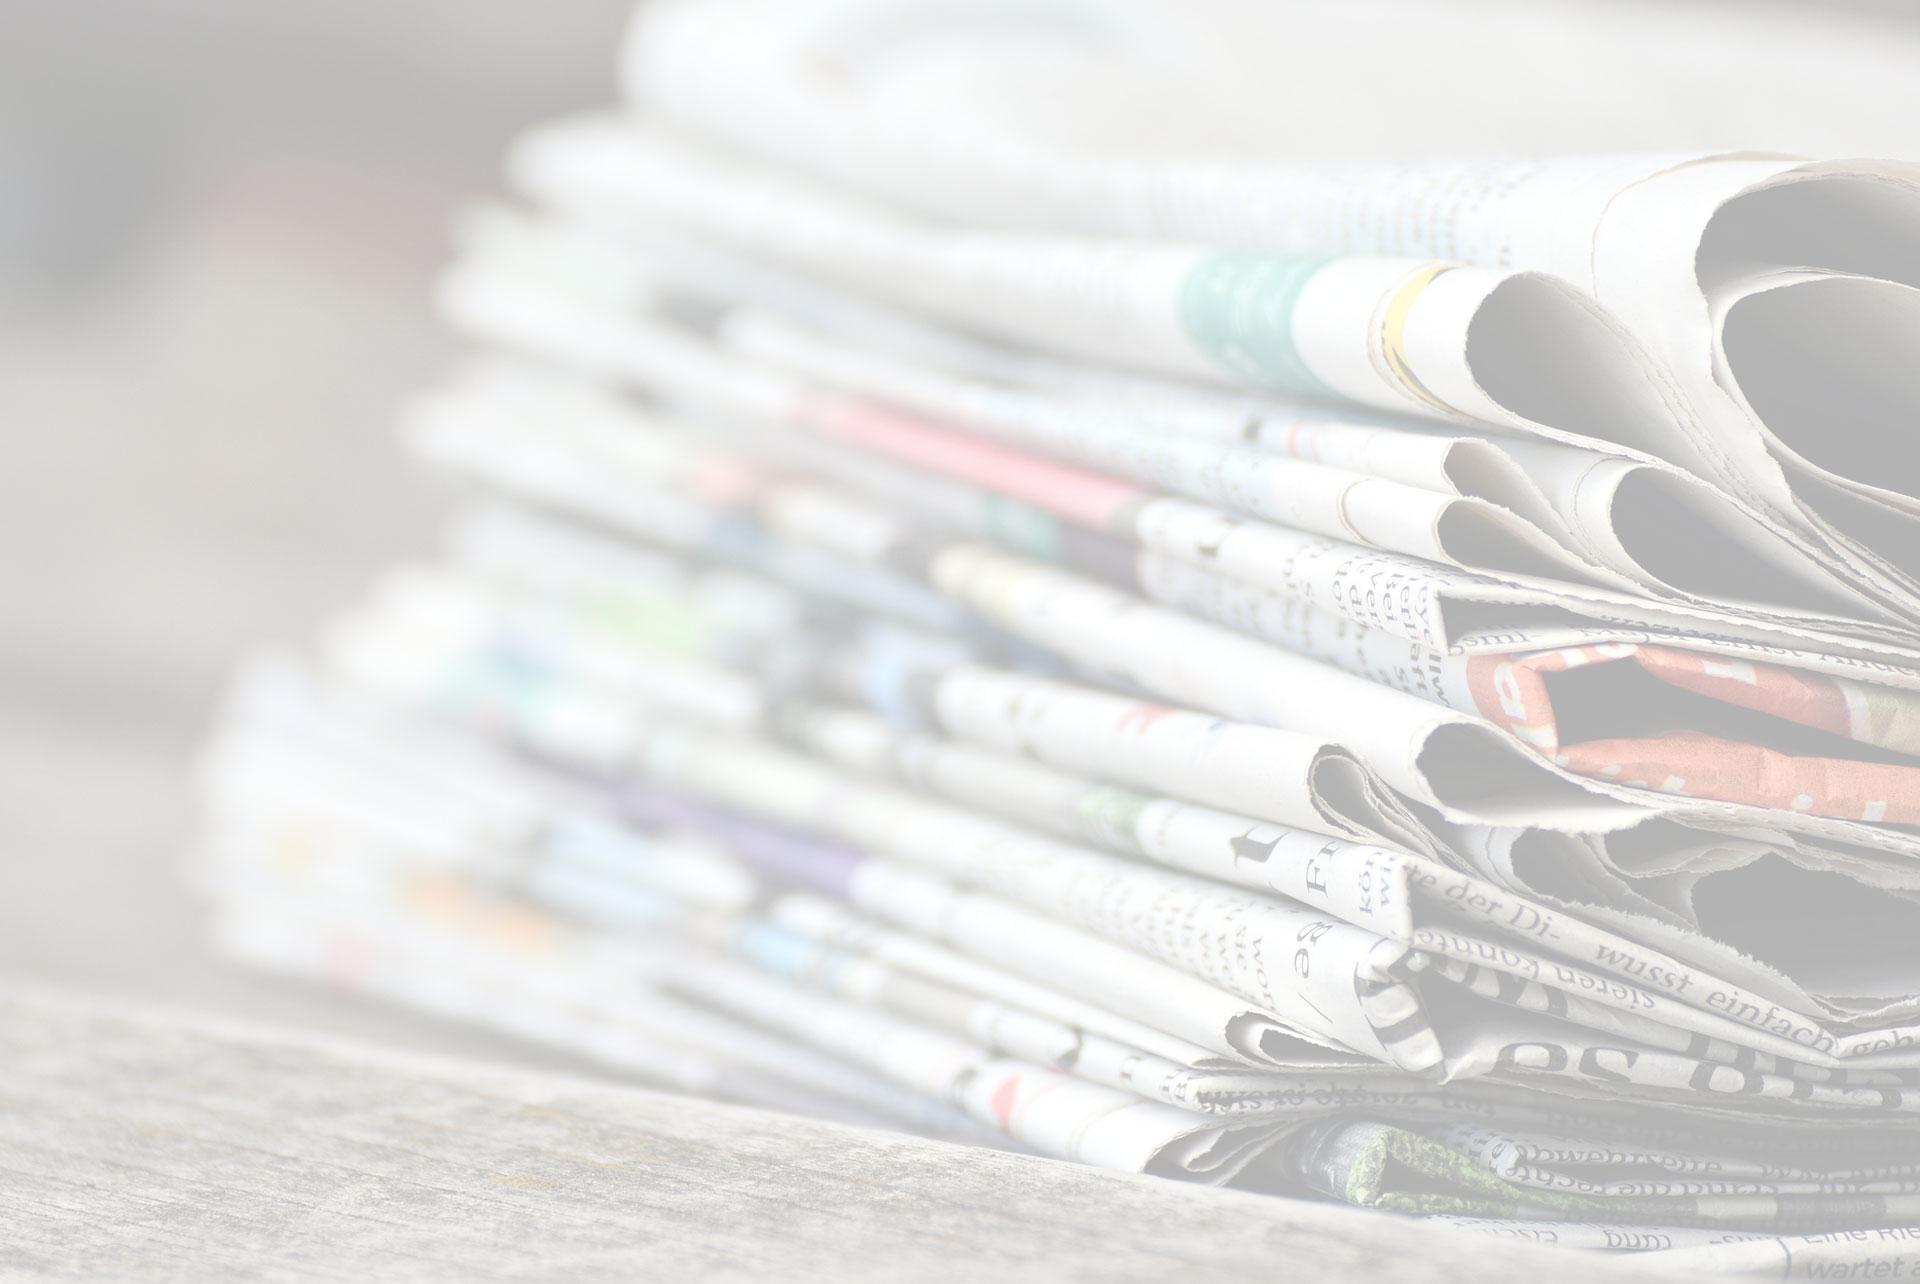 Qual. EuroBasket 2021, l'Italia parte con una vittoria. Russ